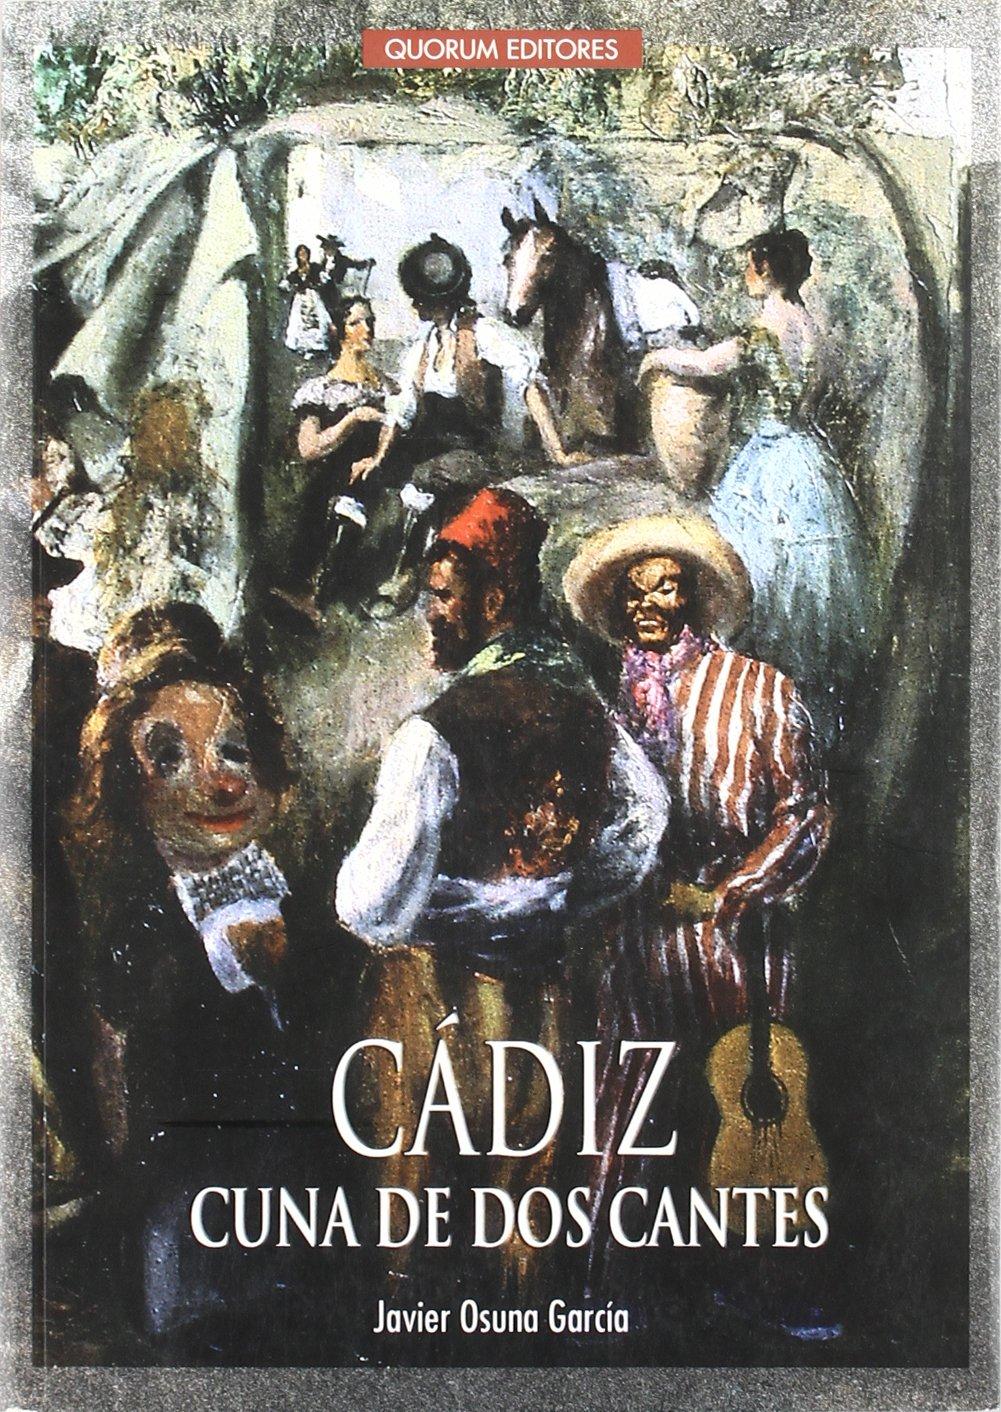 Cádiz cuna de dos cantes: Amazon.es: Javier Osuna García ...